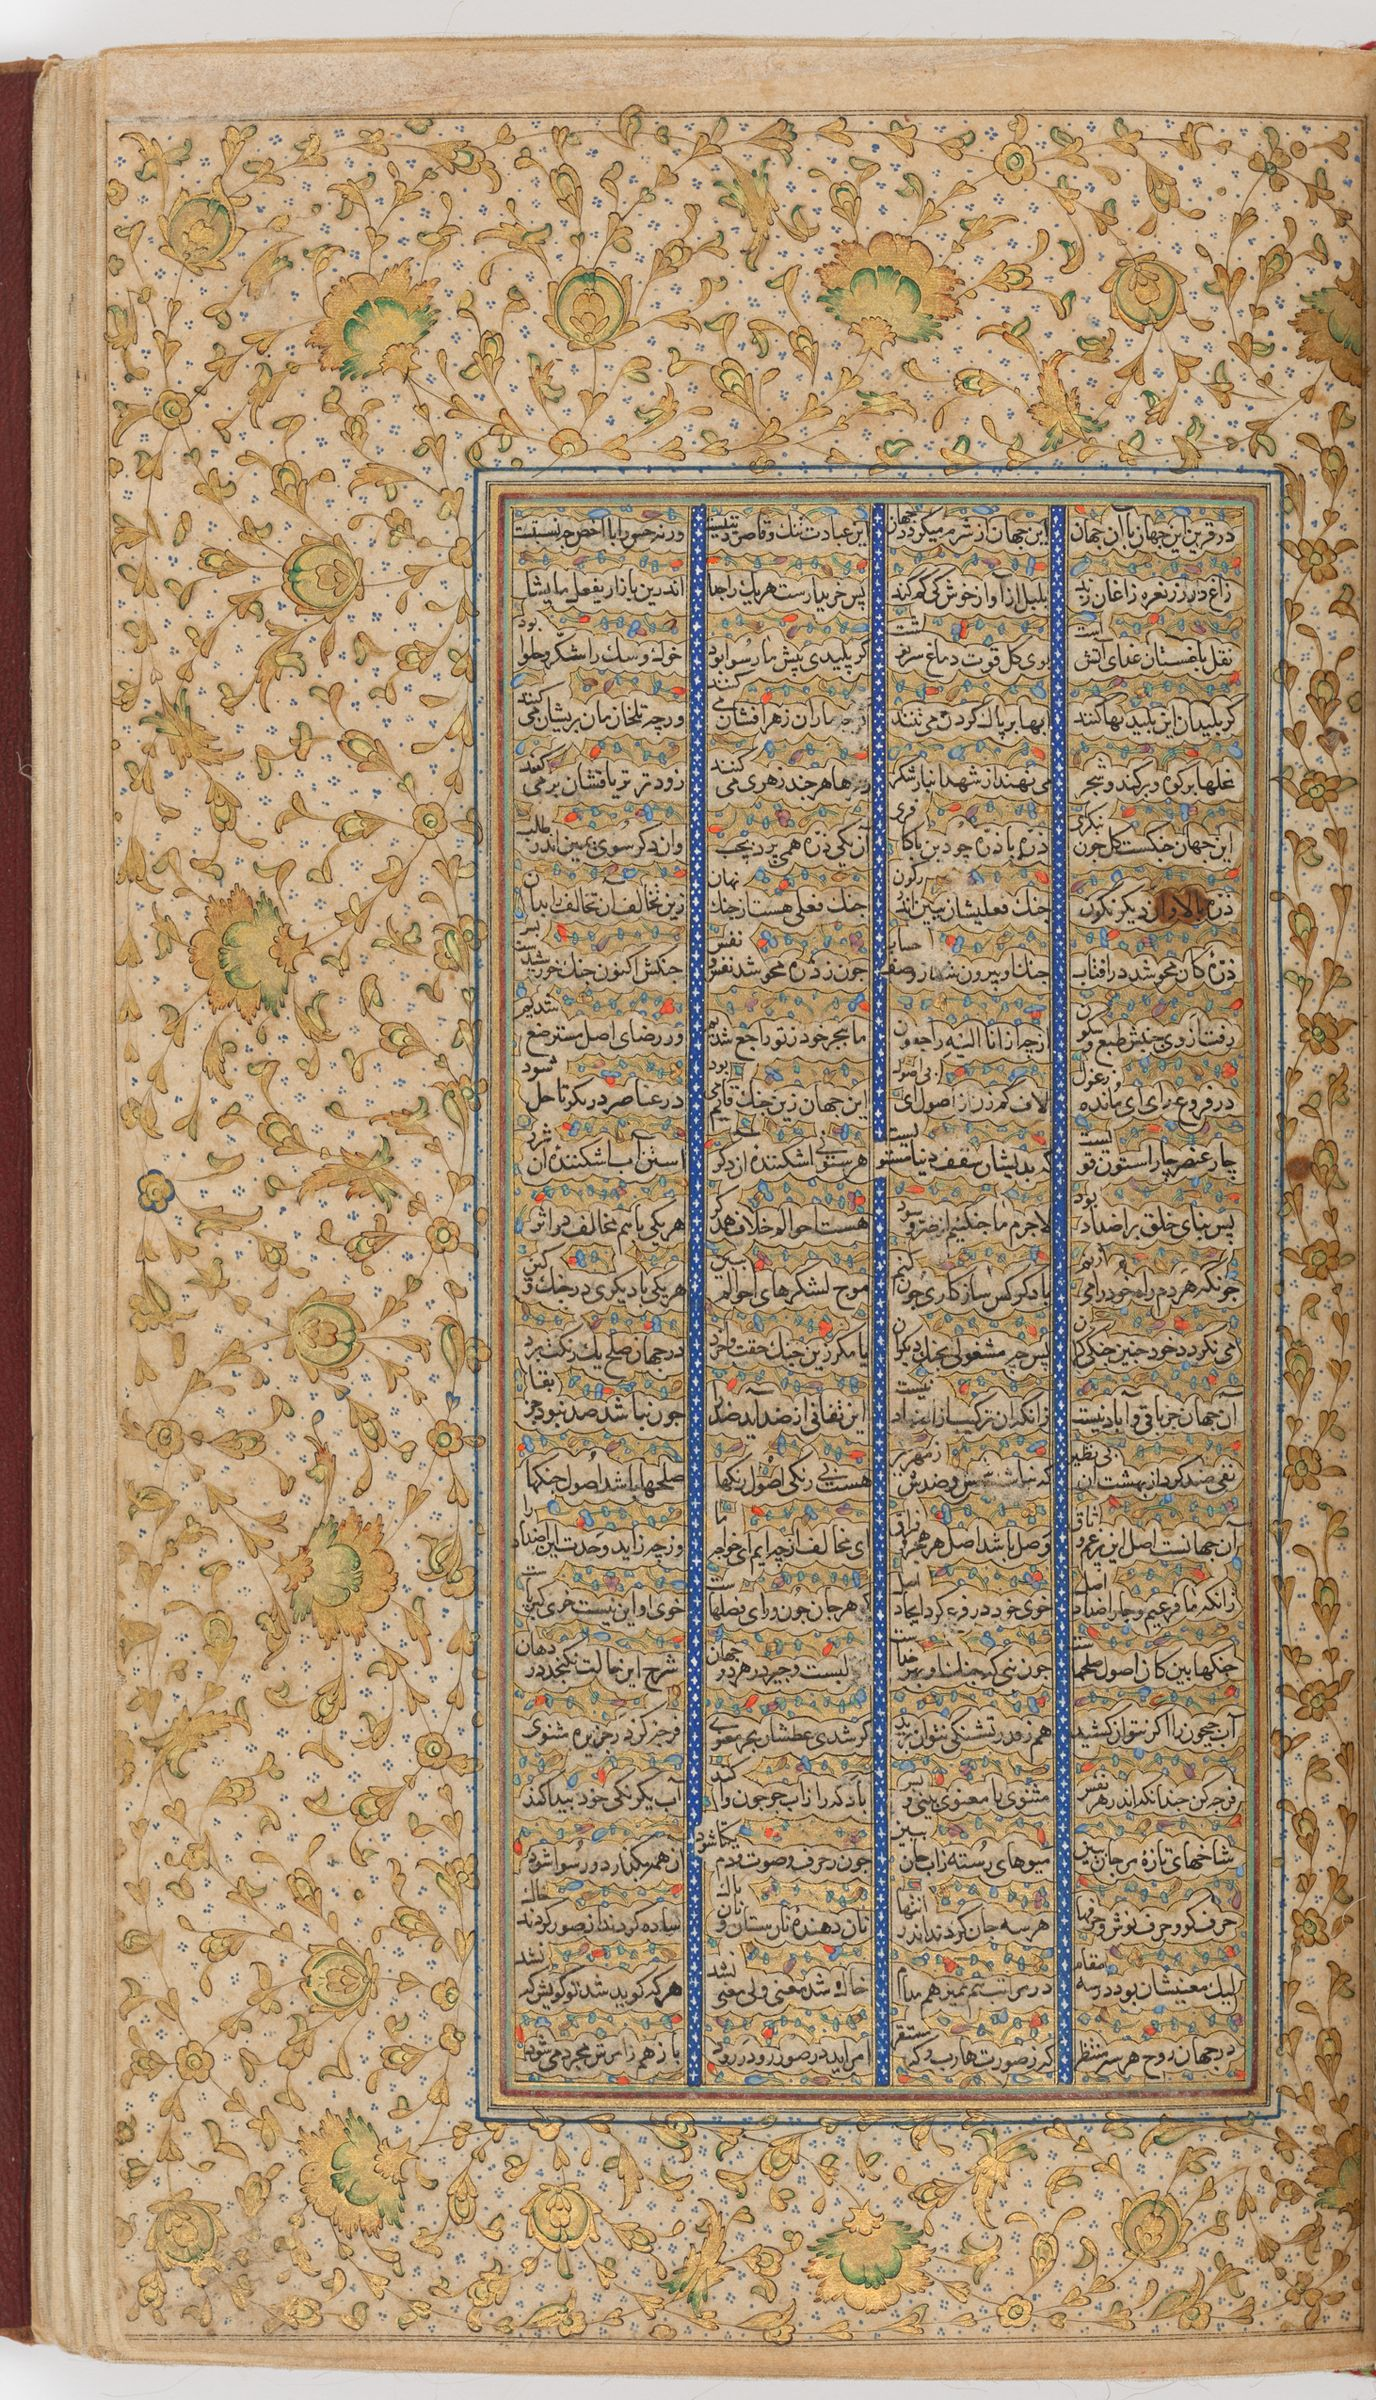 Illuminated Margin And Interlinear Gilt Text Folio (Illumination And Gilt Recto; Text Verso Of Folio 241), From A Manuscript Of The Mathnavi Ma'navi By Maulana Jalal Al-Din Rumi